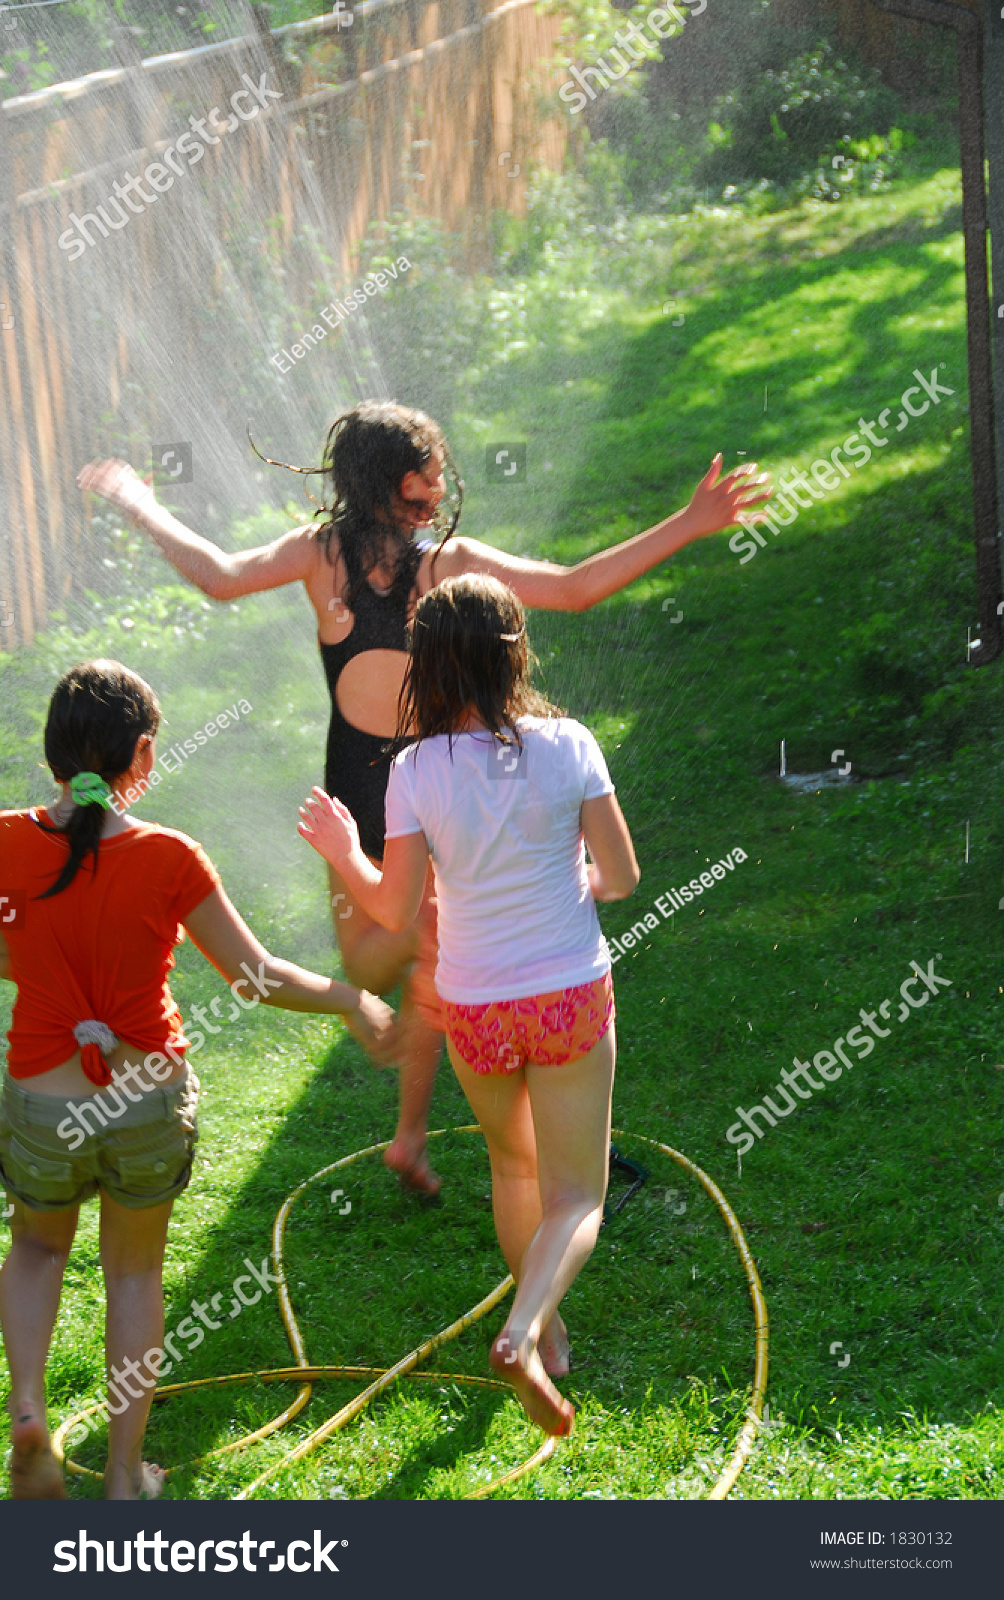 young girls running through sprinkler backyard stock photo 1830132